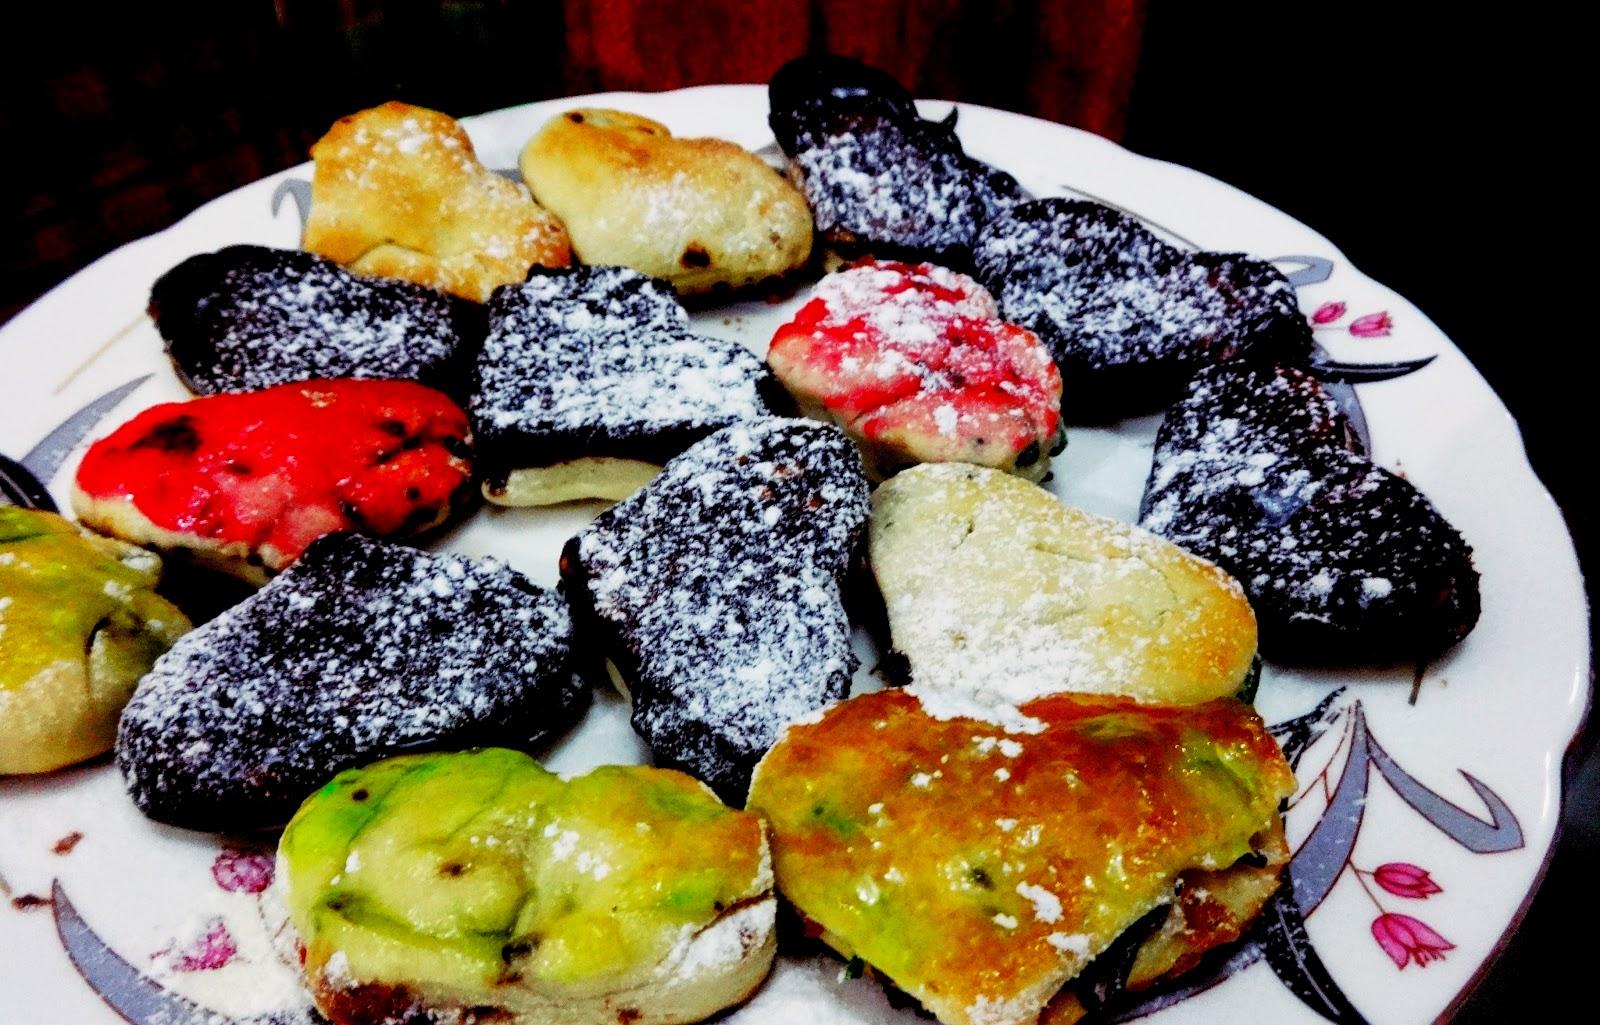 Heart shaped mini doughnuts